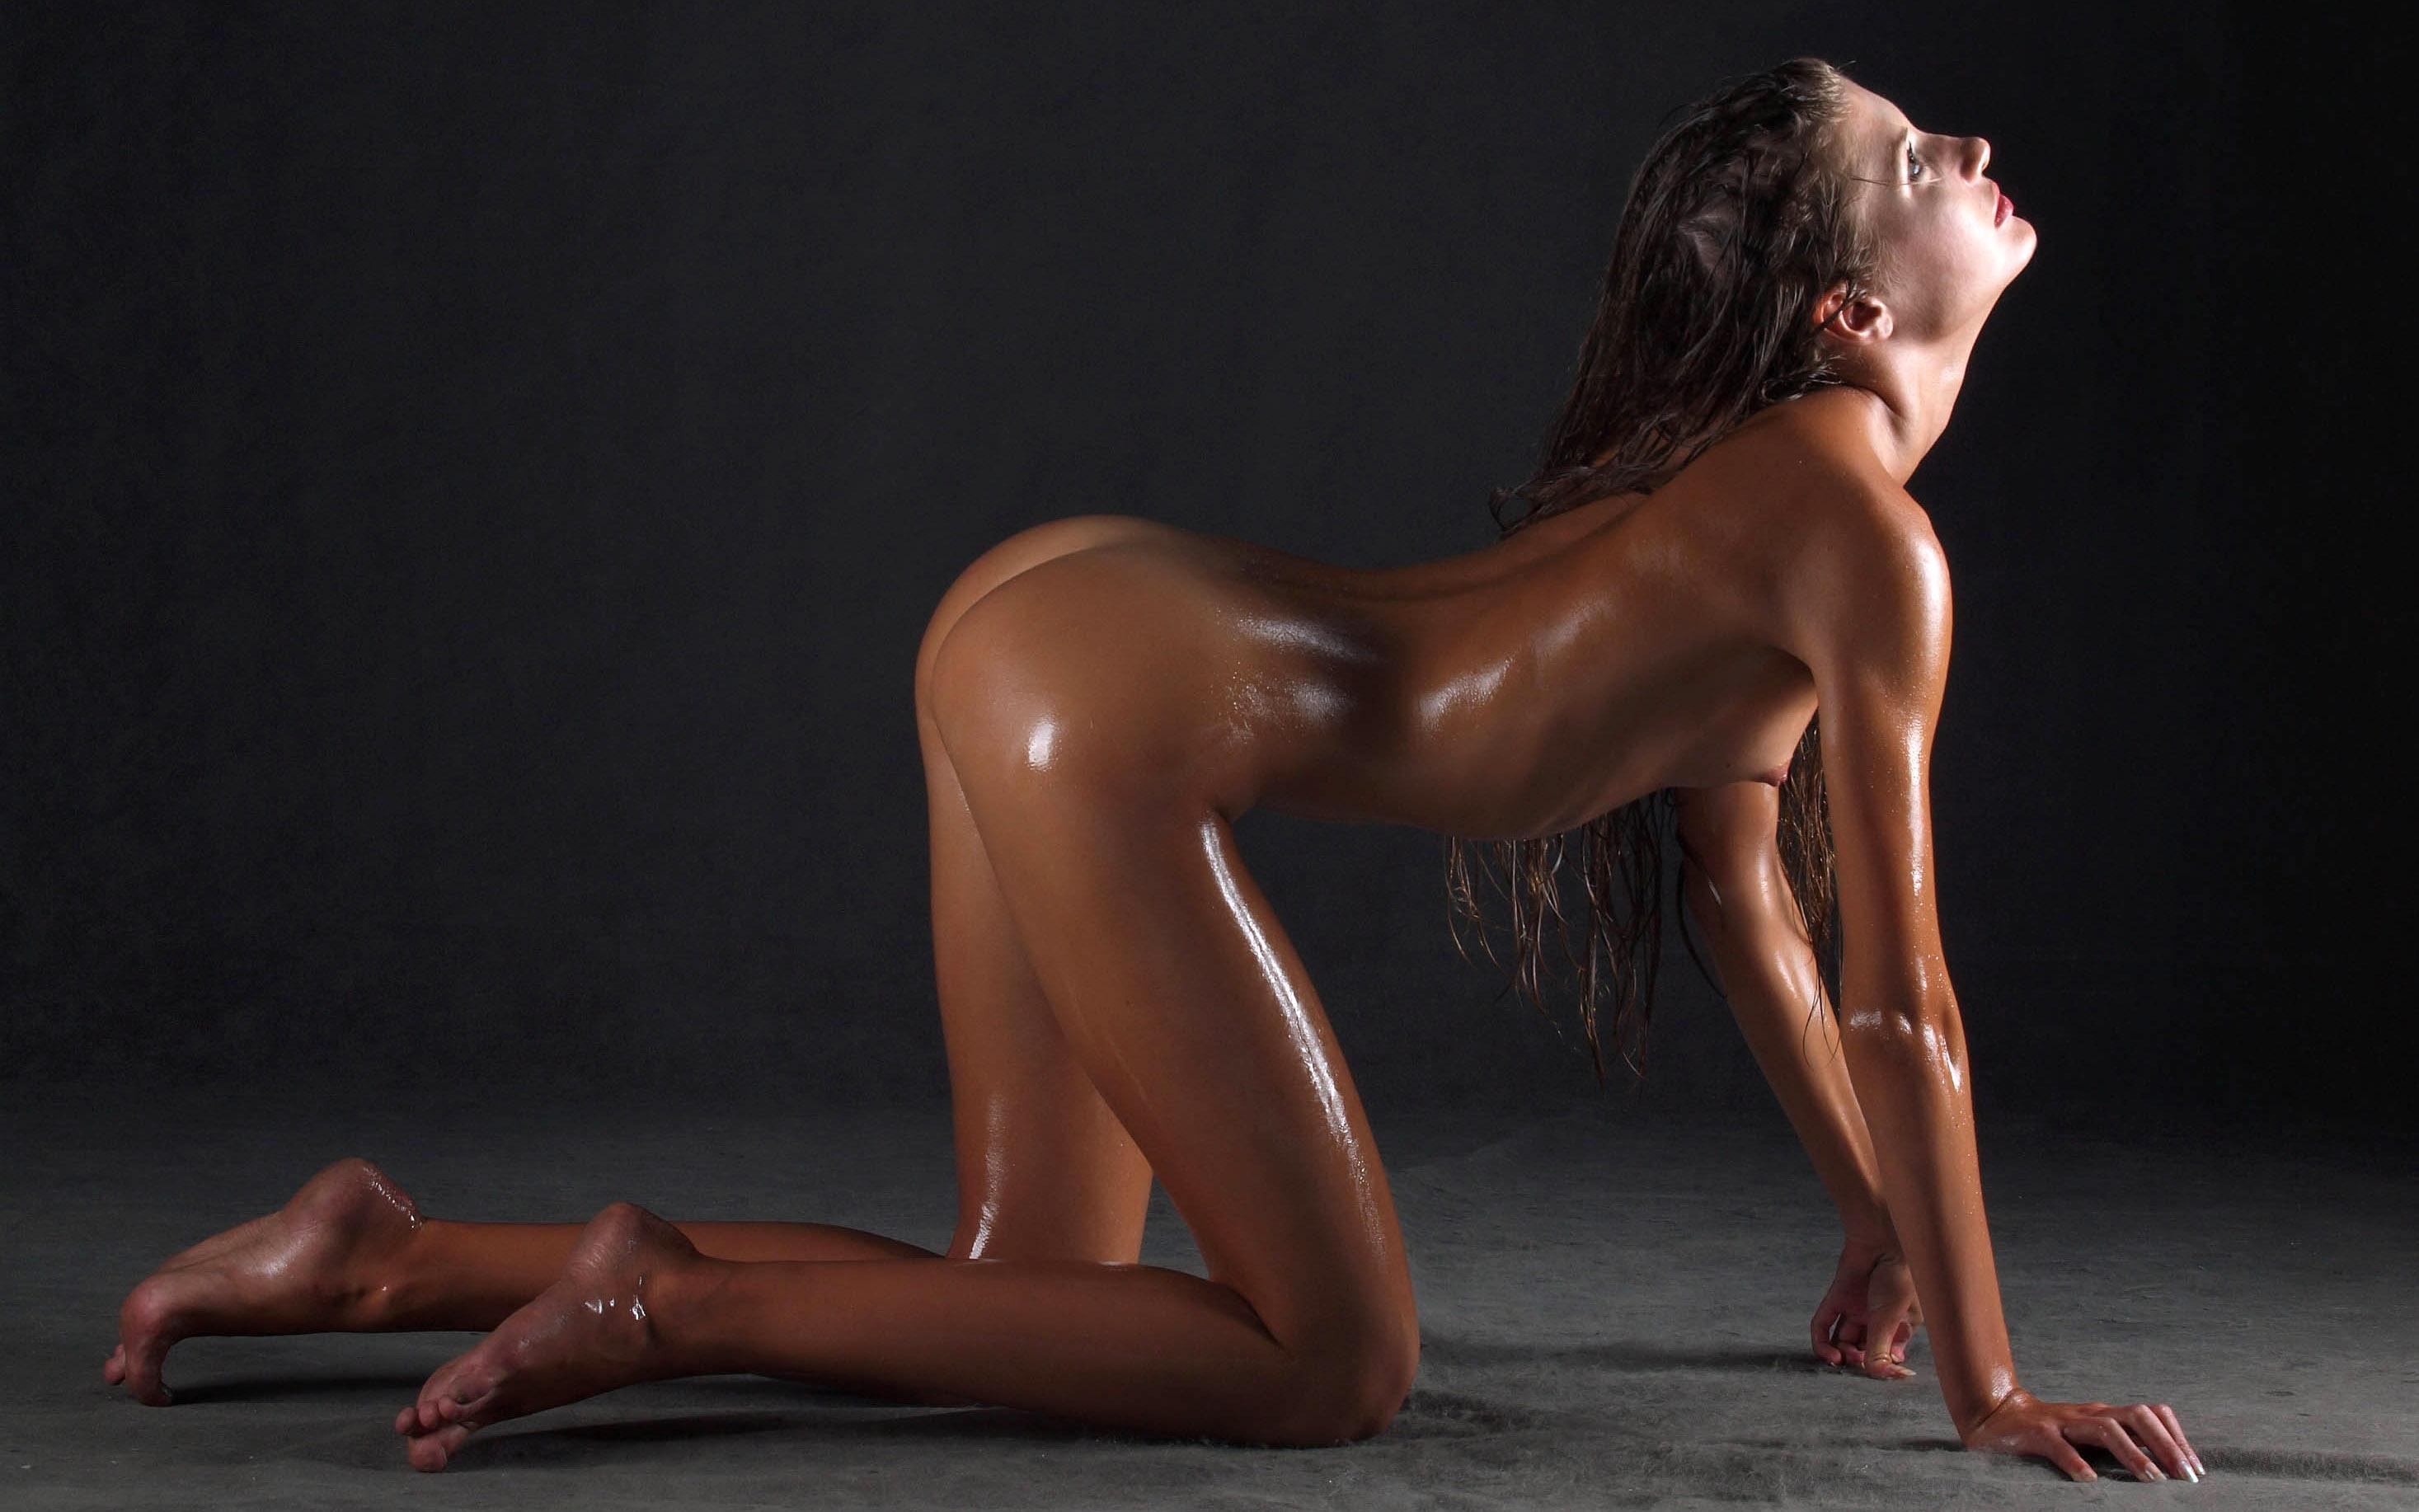 Sexy Oiled Female Body In Black Erotic Lingerie Stock Photo